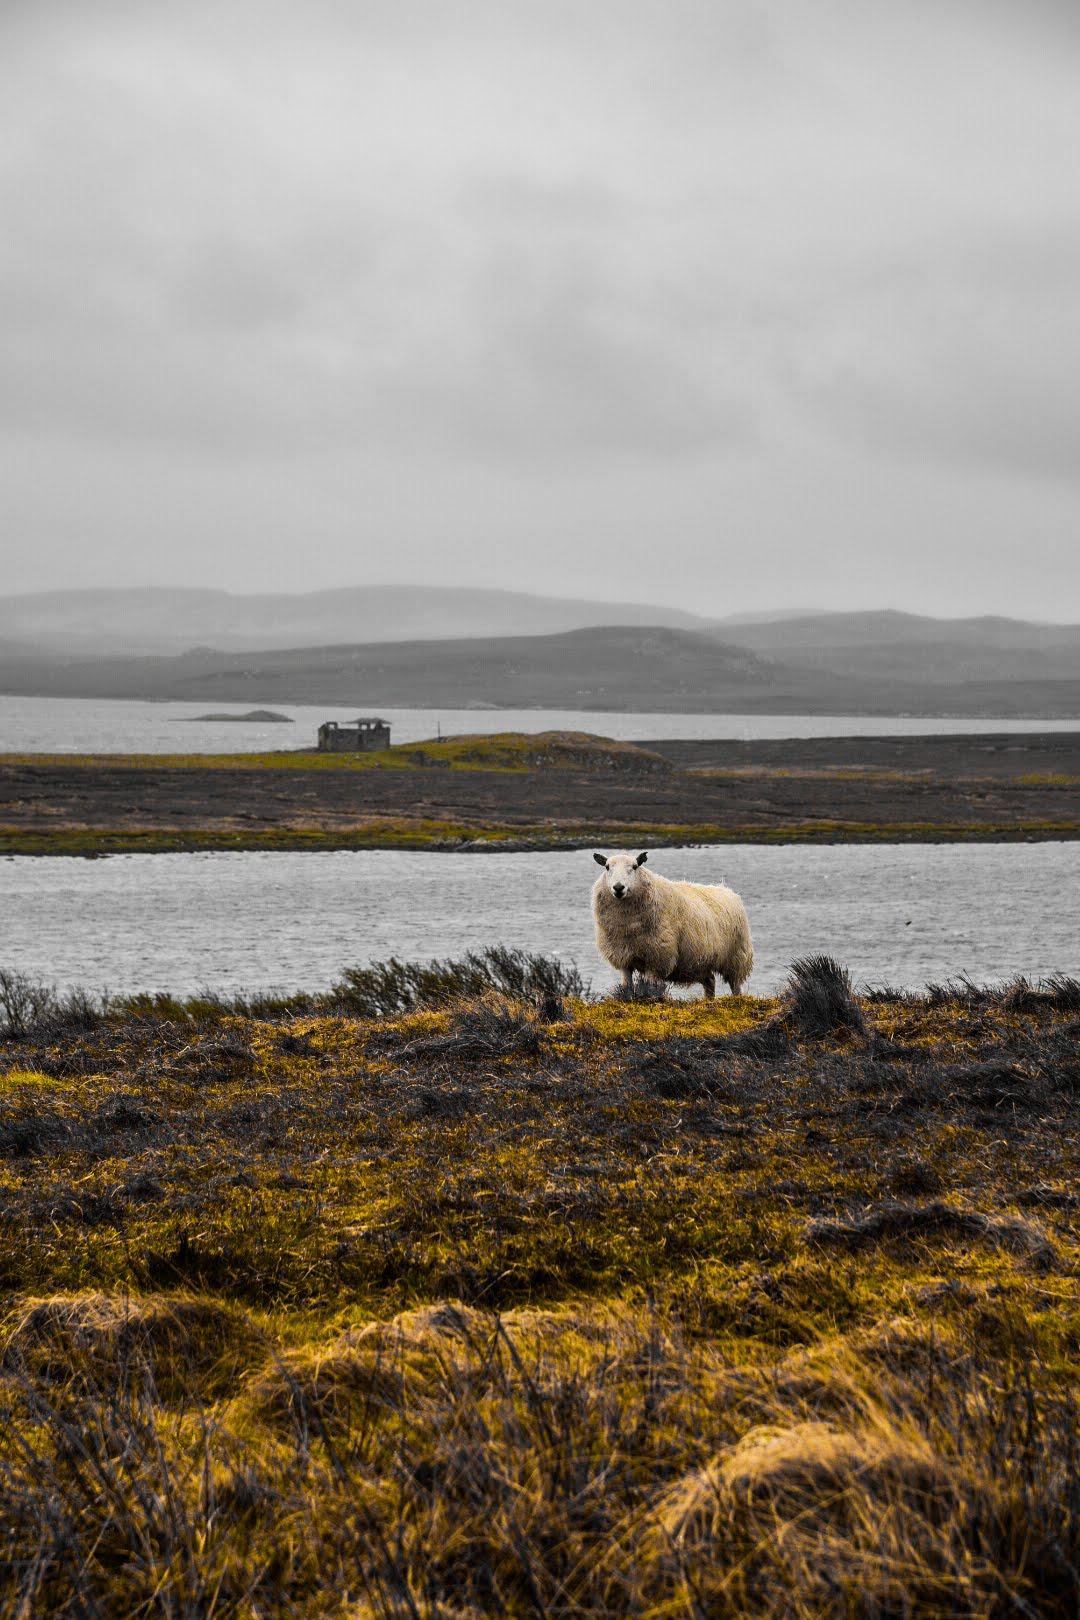 Sheep in Rusty Scottish Medow